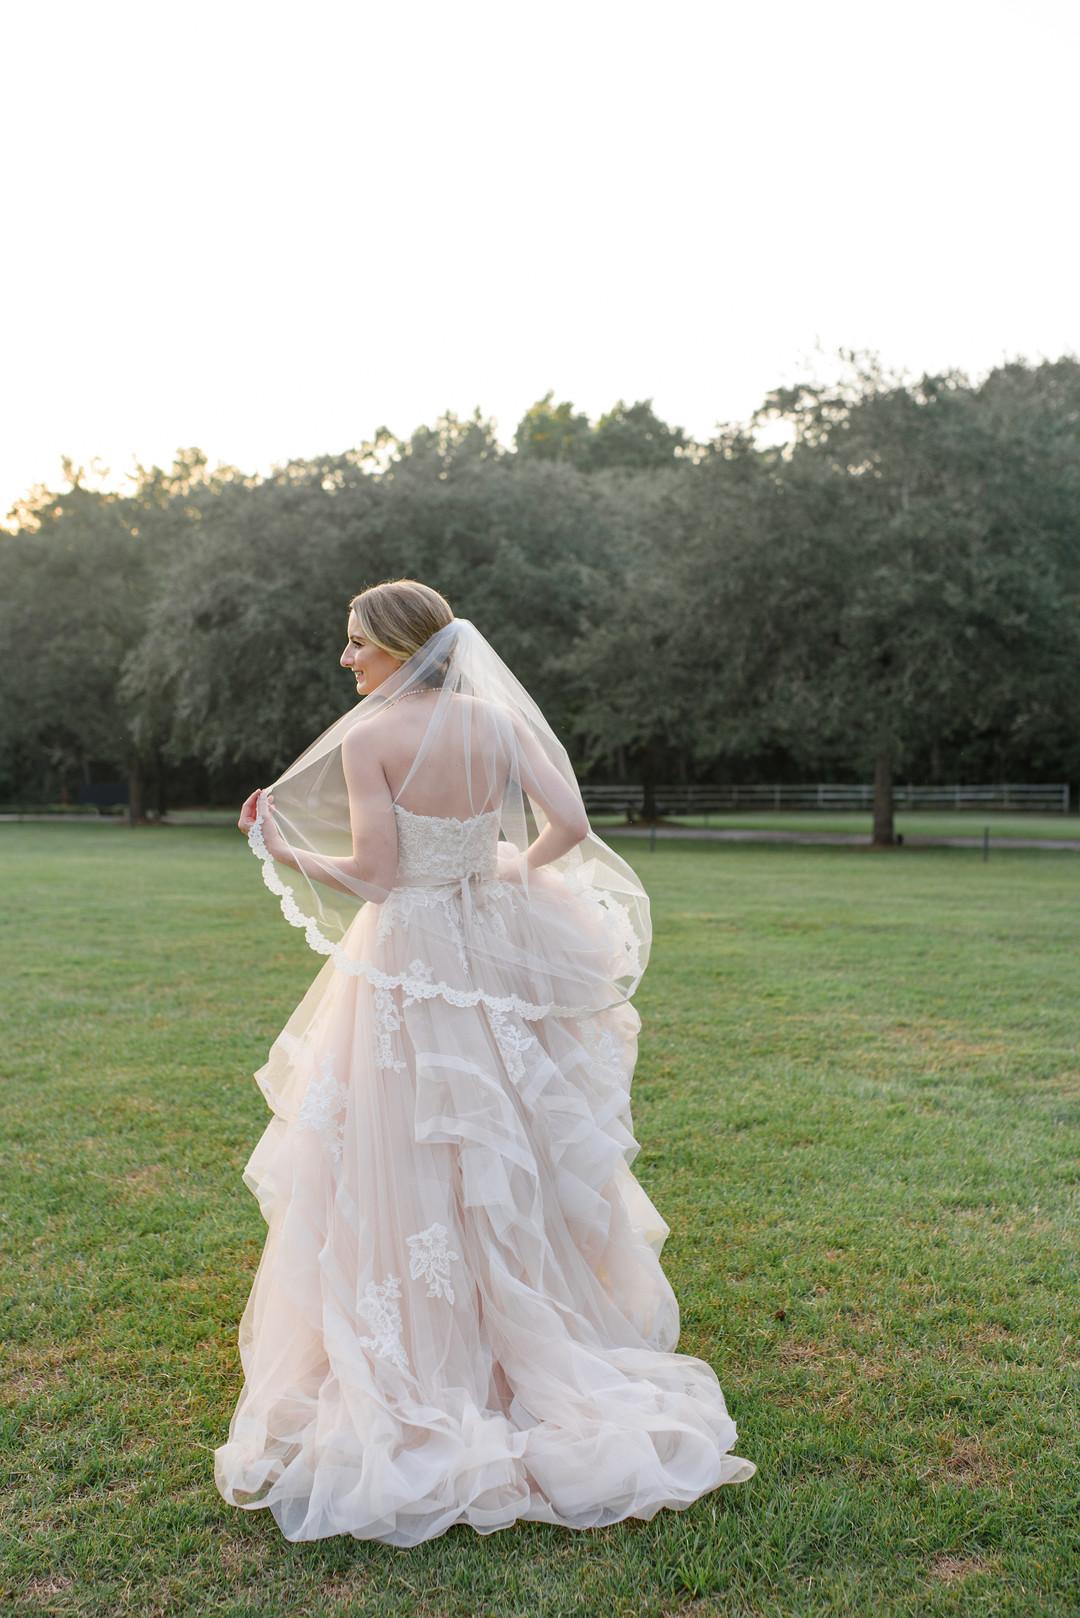 old-wide-awake-plantation-wedding-16.JPG